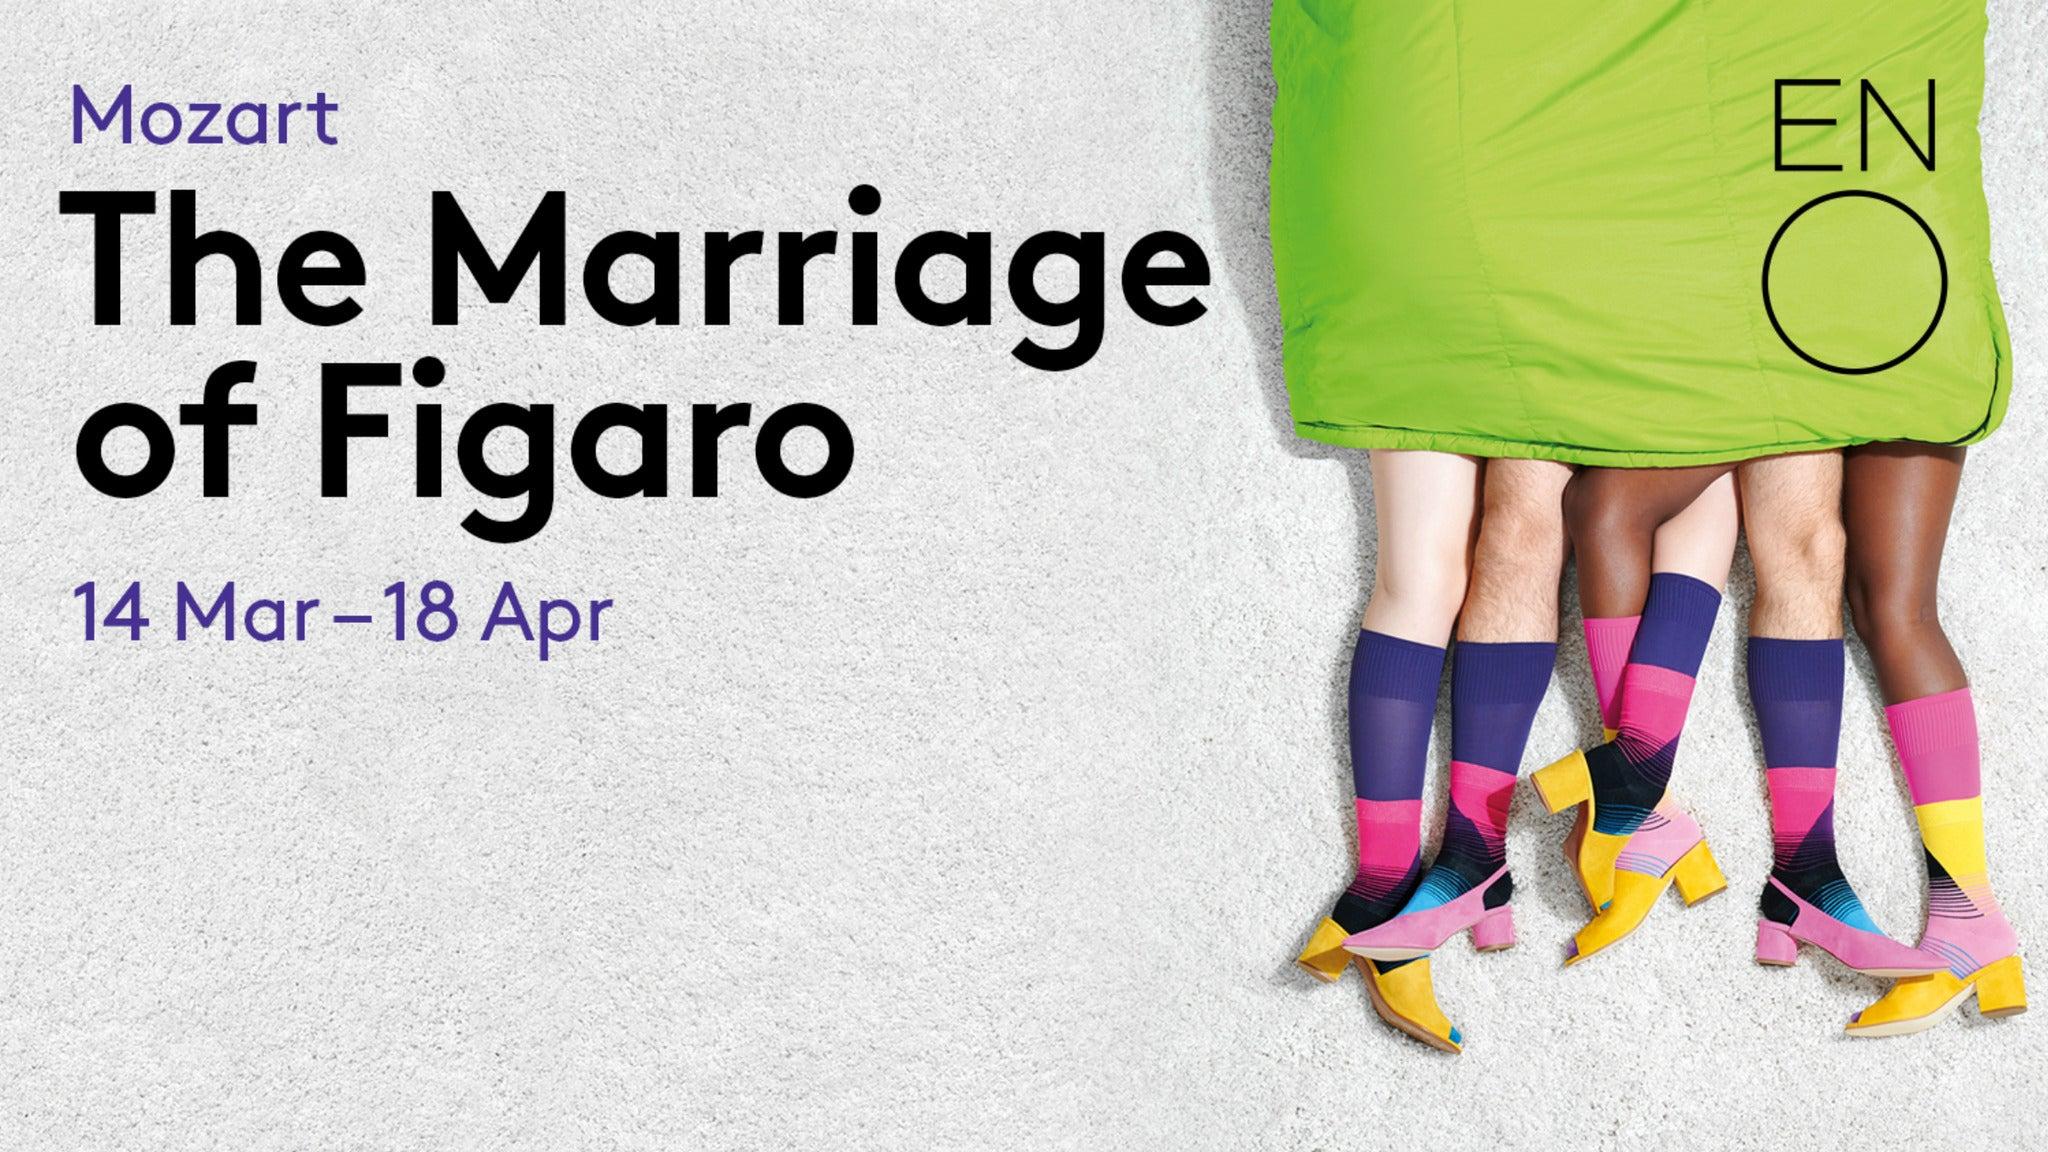 The Marriage of Figaro - English National Opera